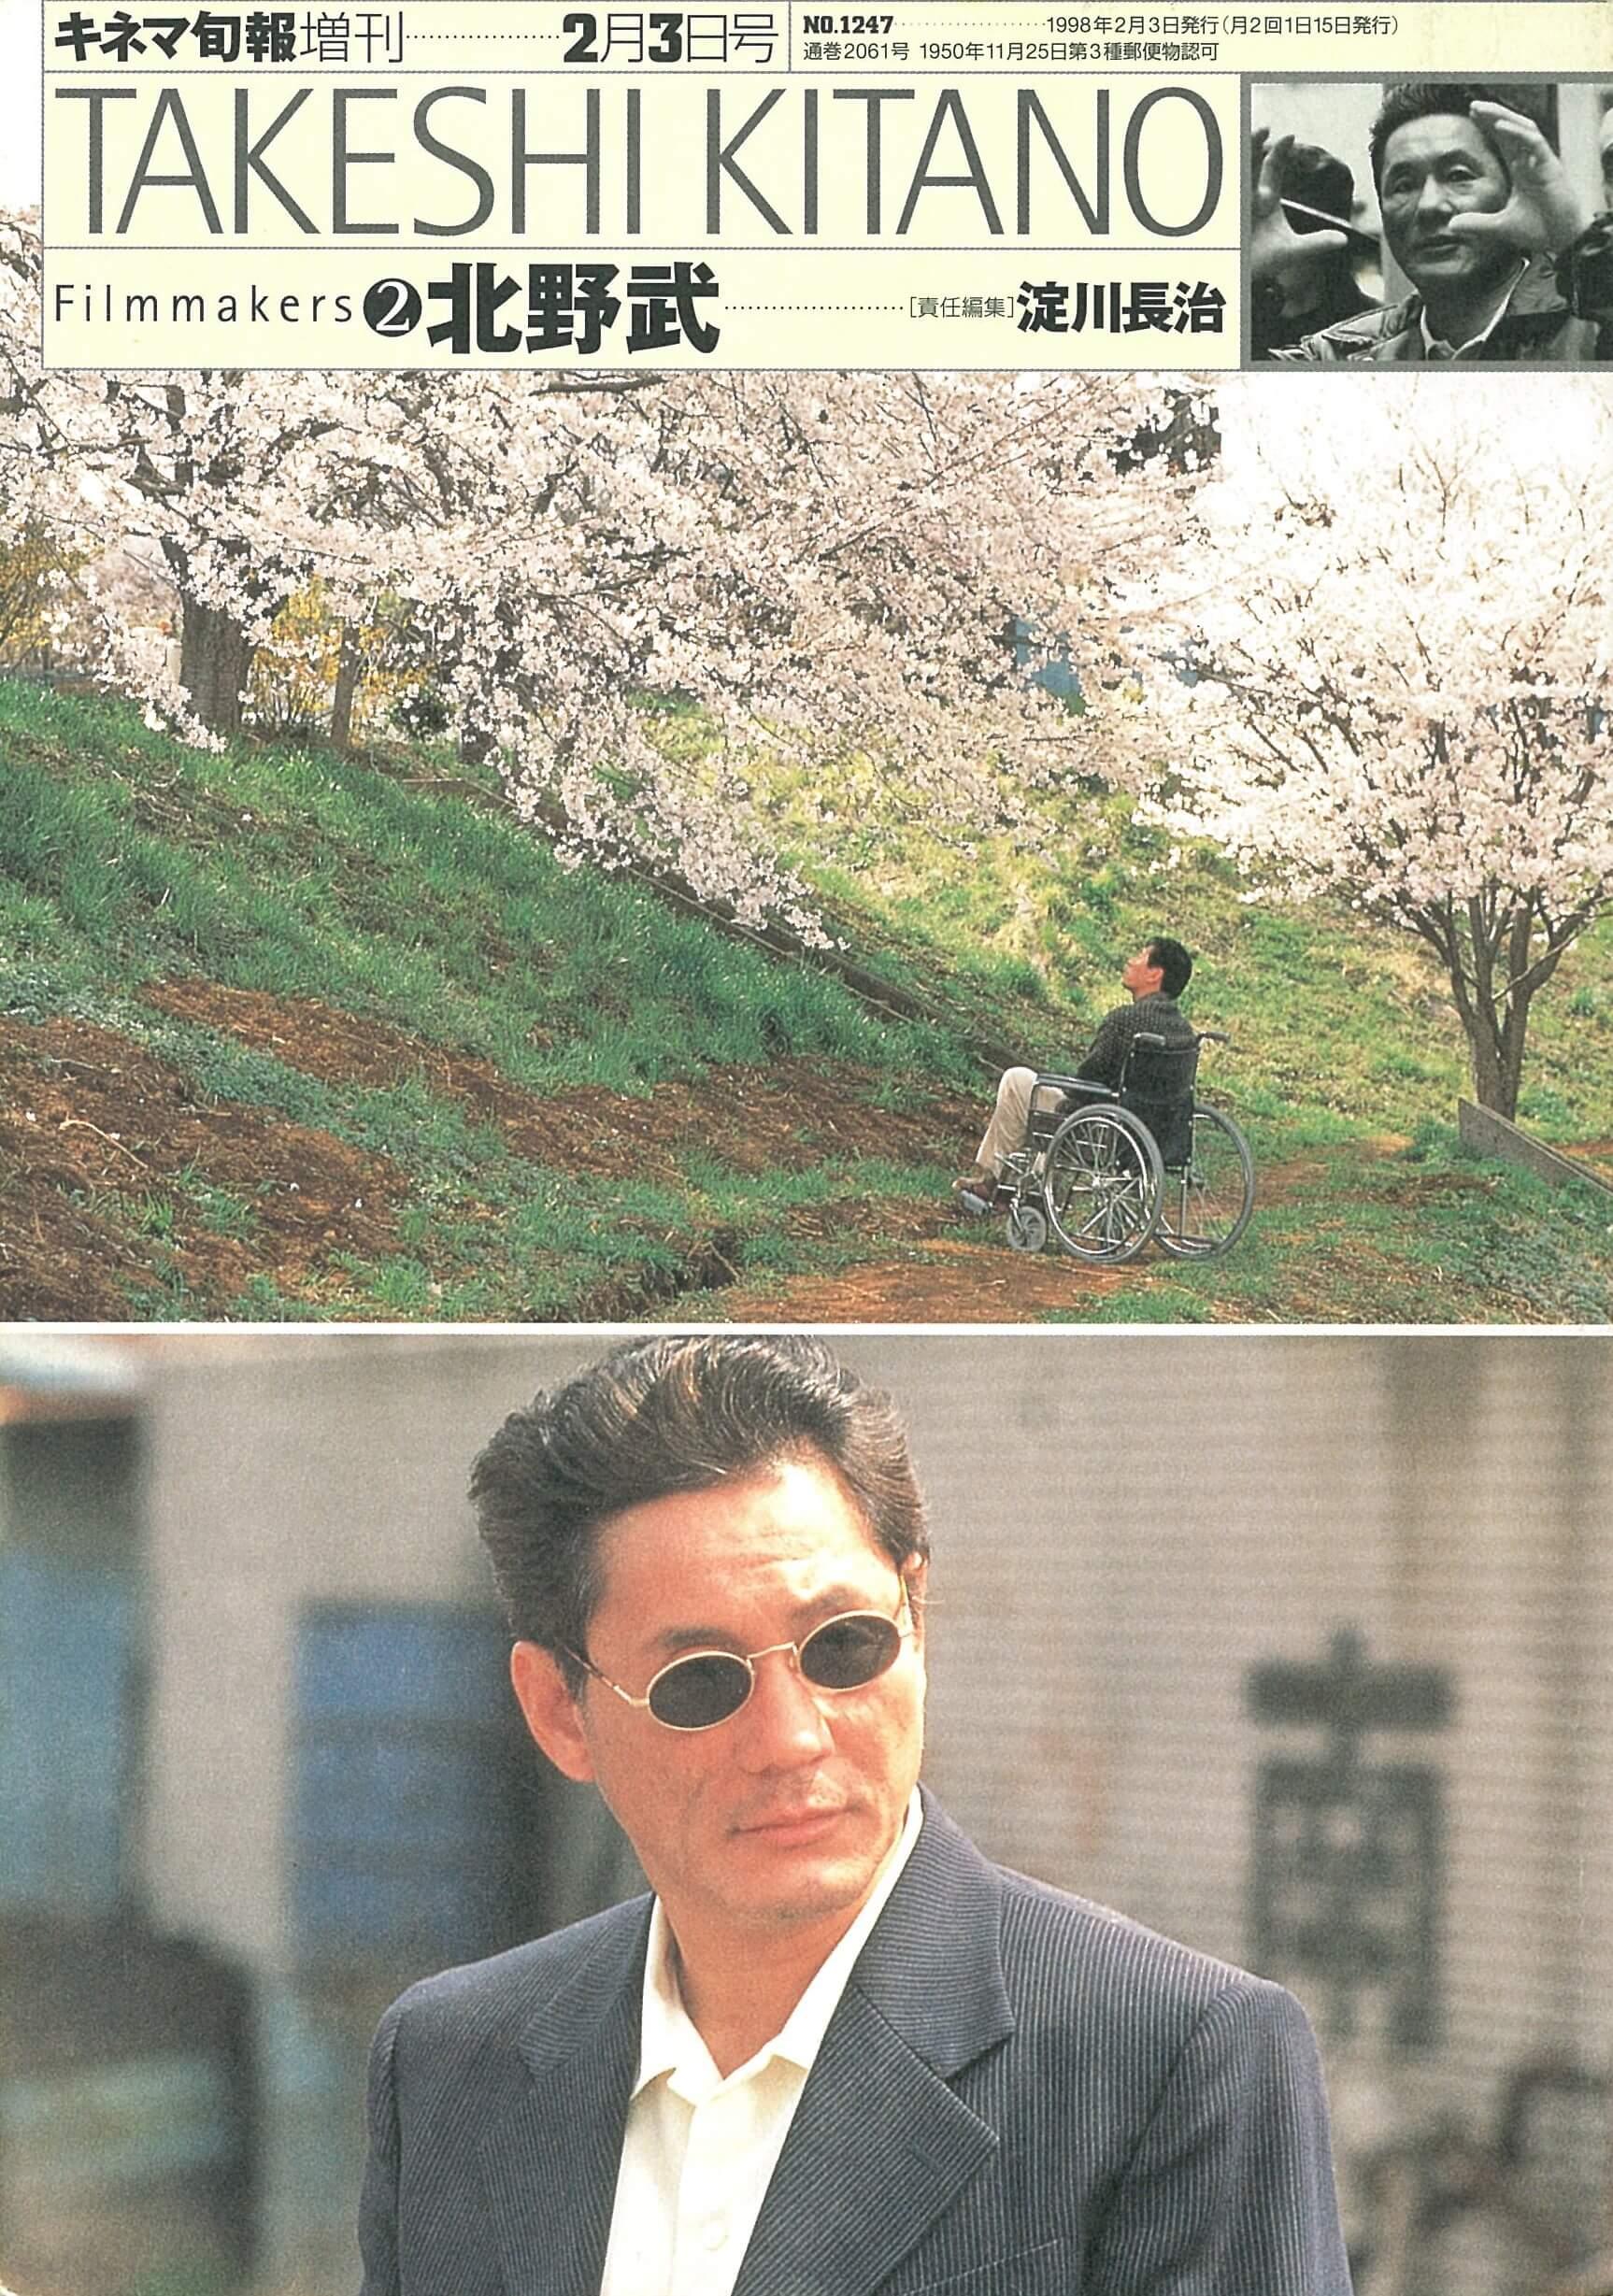 Blog キネマ旬報増刊 1998年2月3日号 No 1247 北野武映画 久石譲